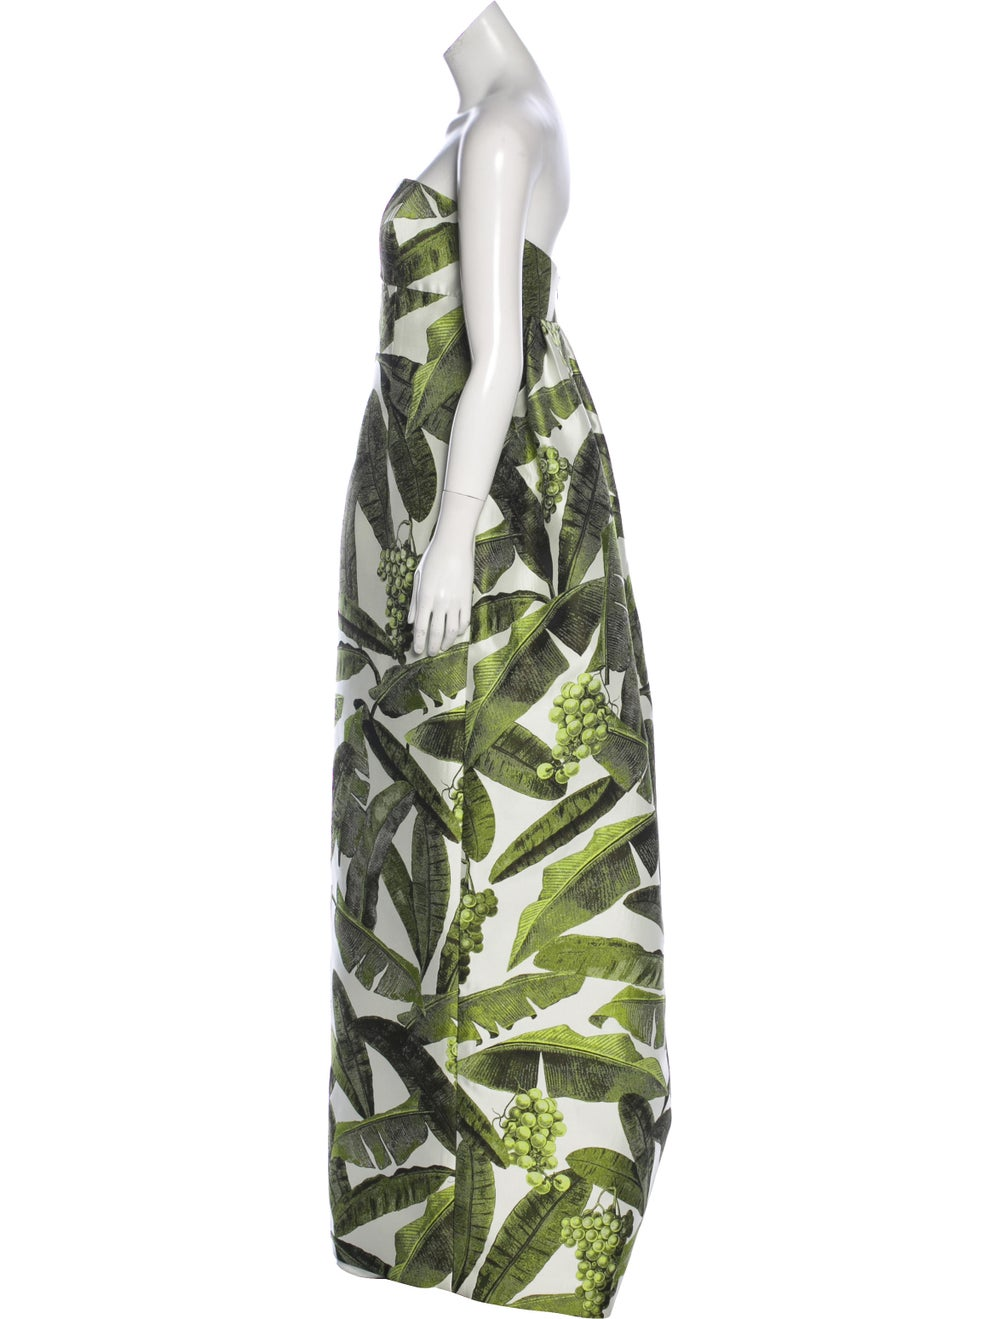 Oscar de la Renta Strapless Maxi Dress multicolor - image 2